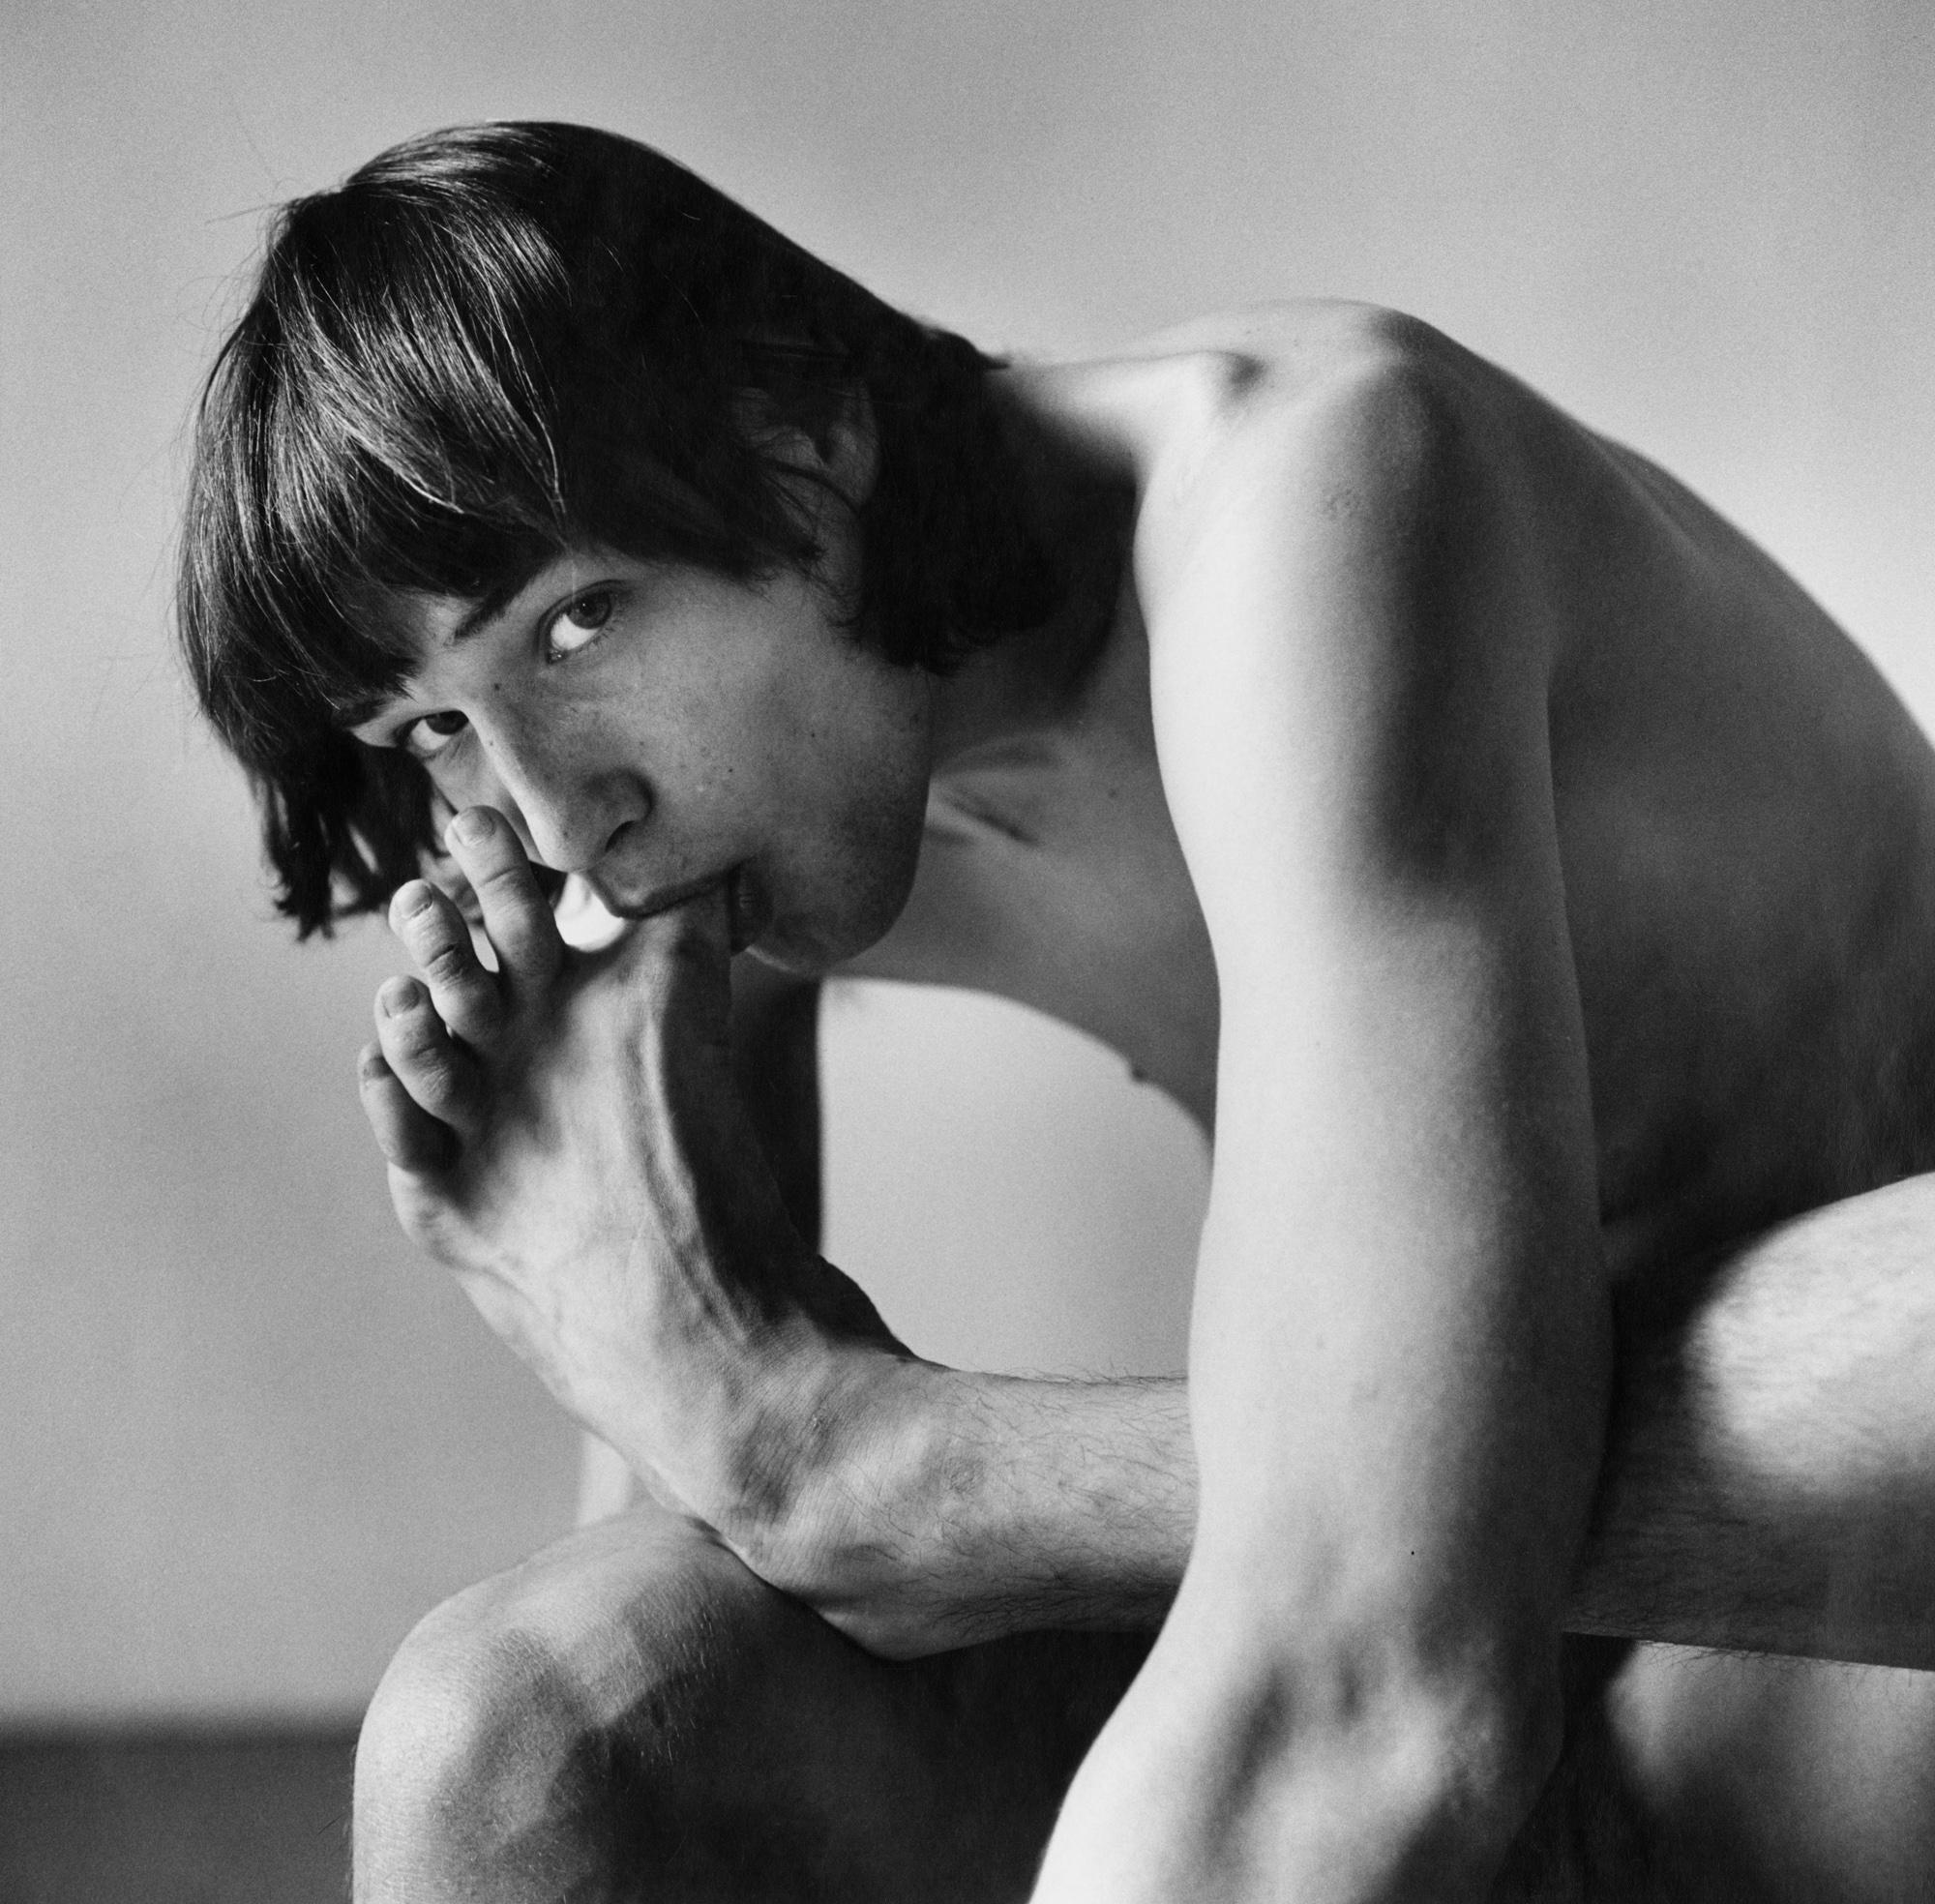 Fotó: Peter Hujar: Daniel Schook Sucking Toe, 1981 © Peter Hujar Archive / Fraenkel Gallery